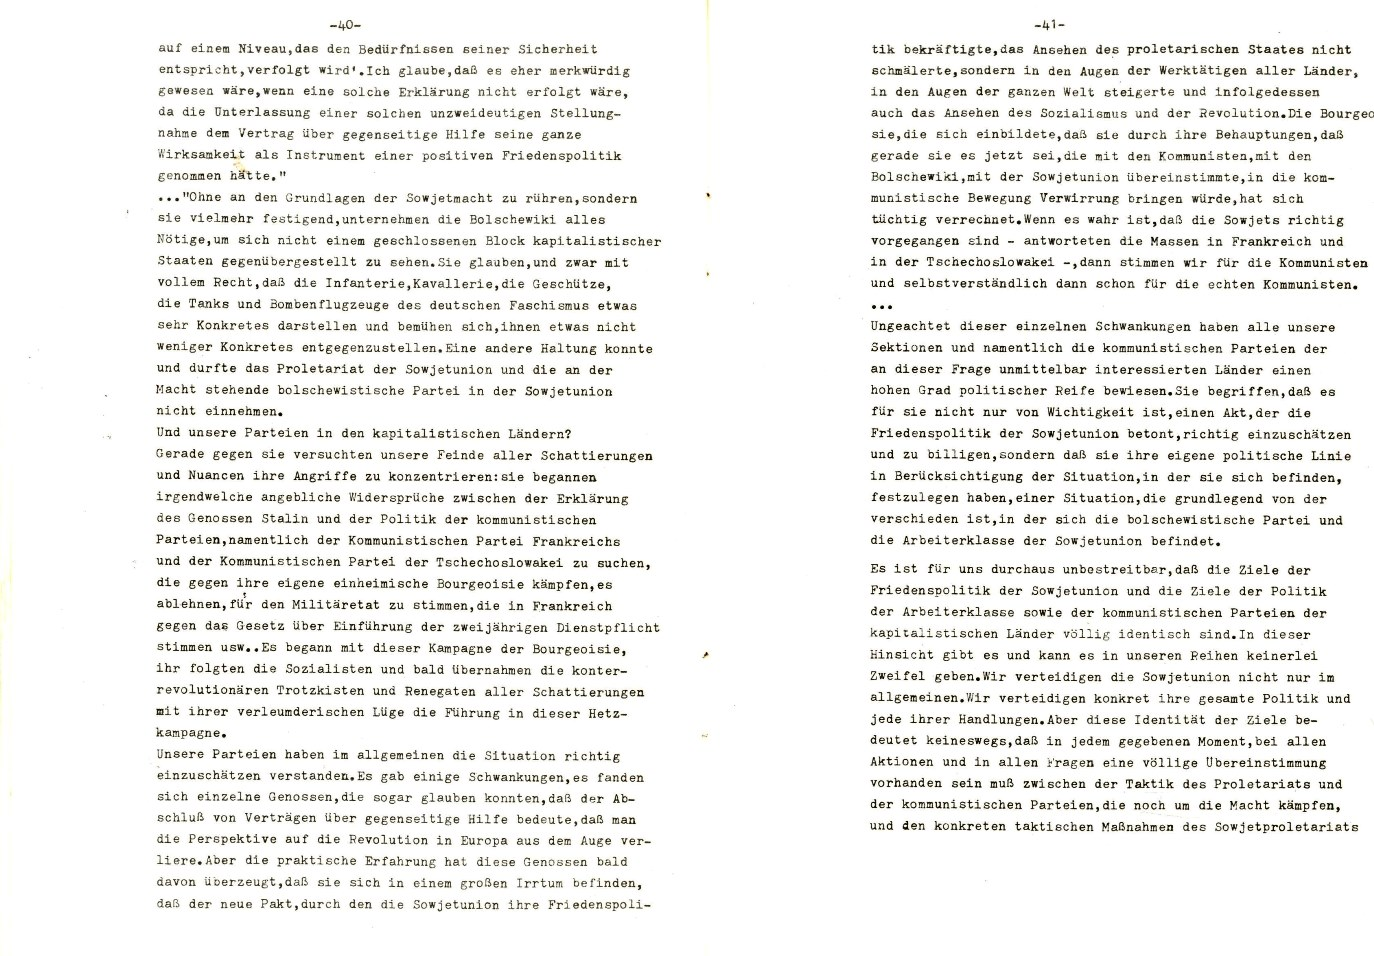 Muenchen_Kampf_dem_Revisionismus_1978_04_05_22